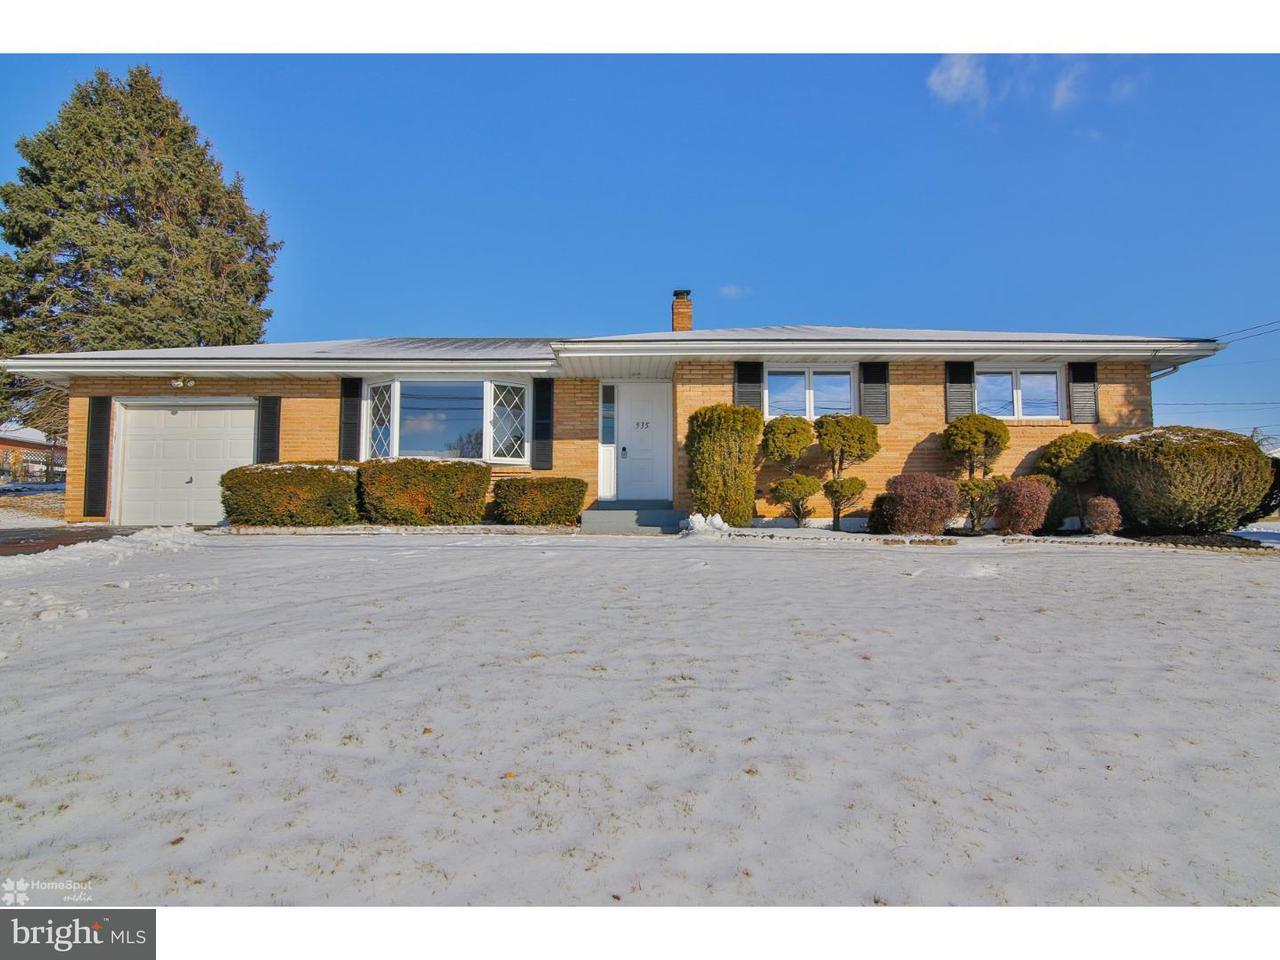 Single Family Home for Sale at 956 KOSSUTH Street Freemansburg, Pennsylvania 18017 United States